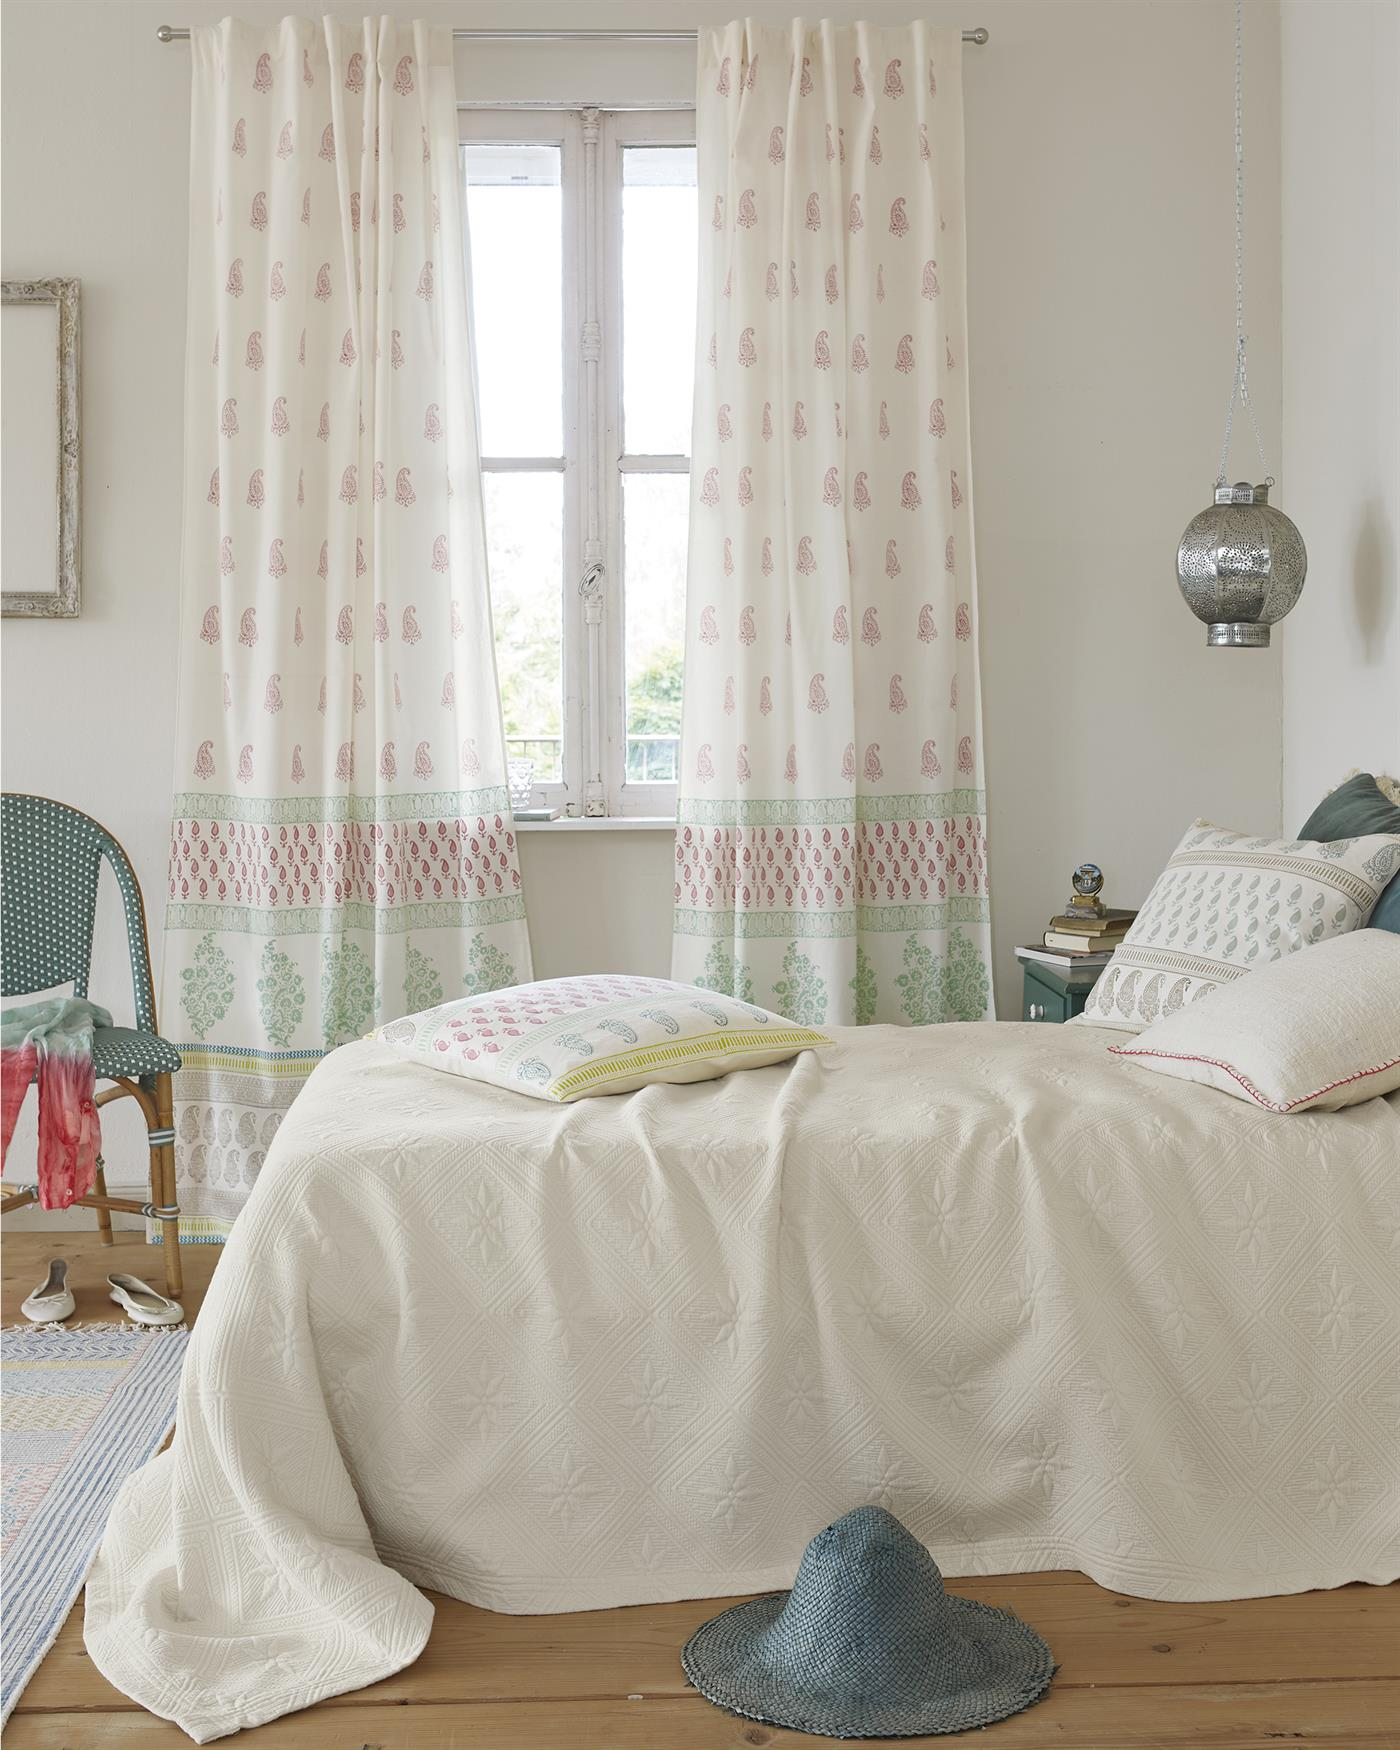 piqu decke joia. Black Bedroom Furniture Sets. Home Design Ideas